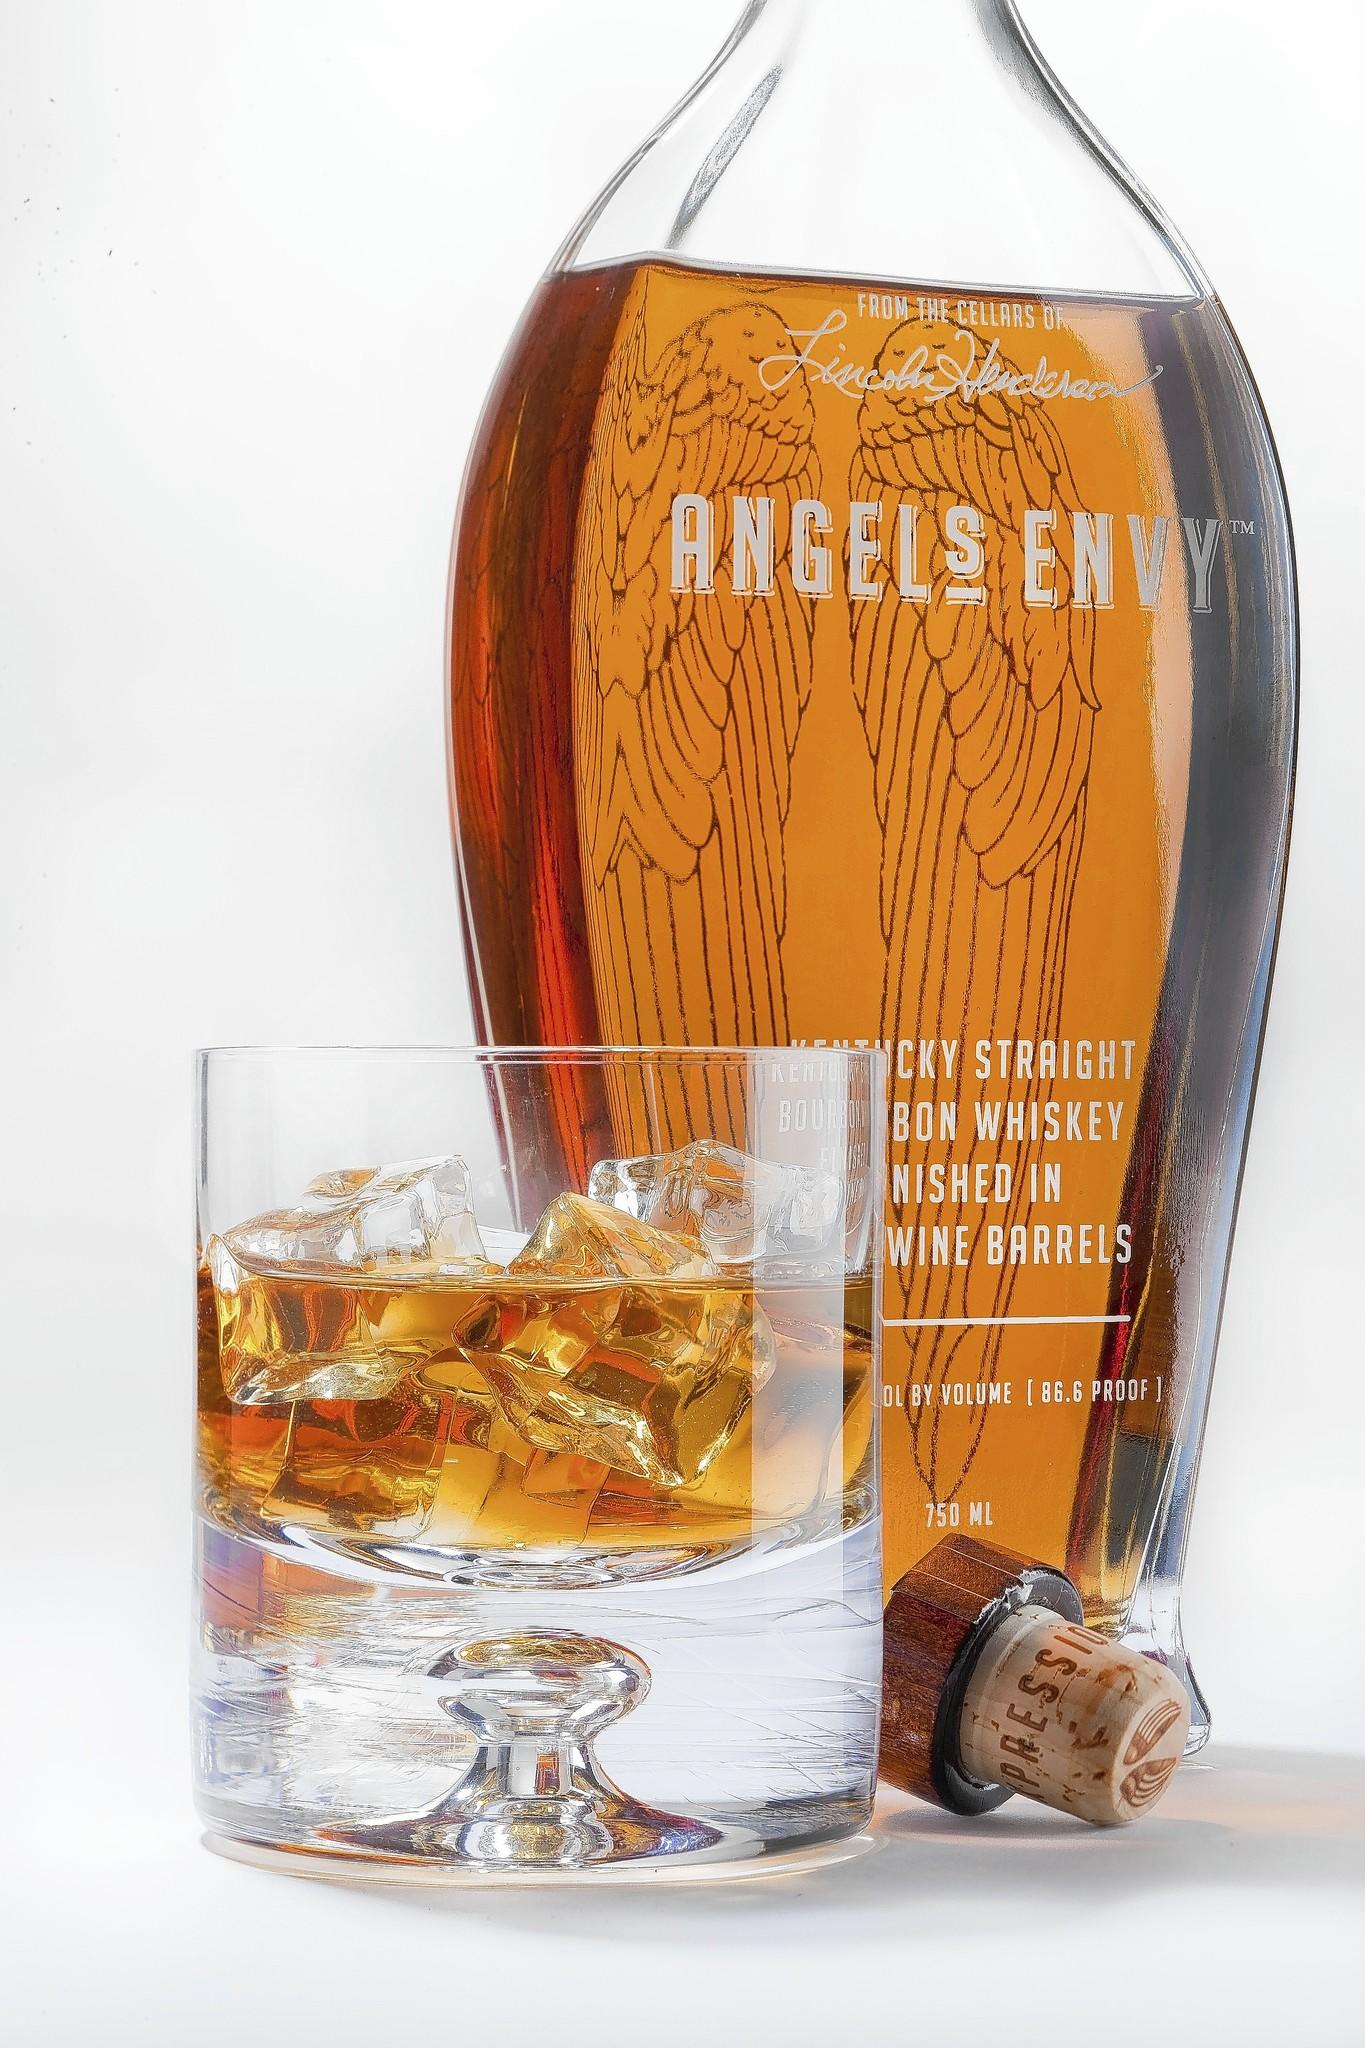 A bottle of Angel's Envy whiskey.